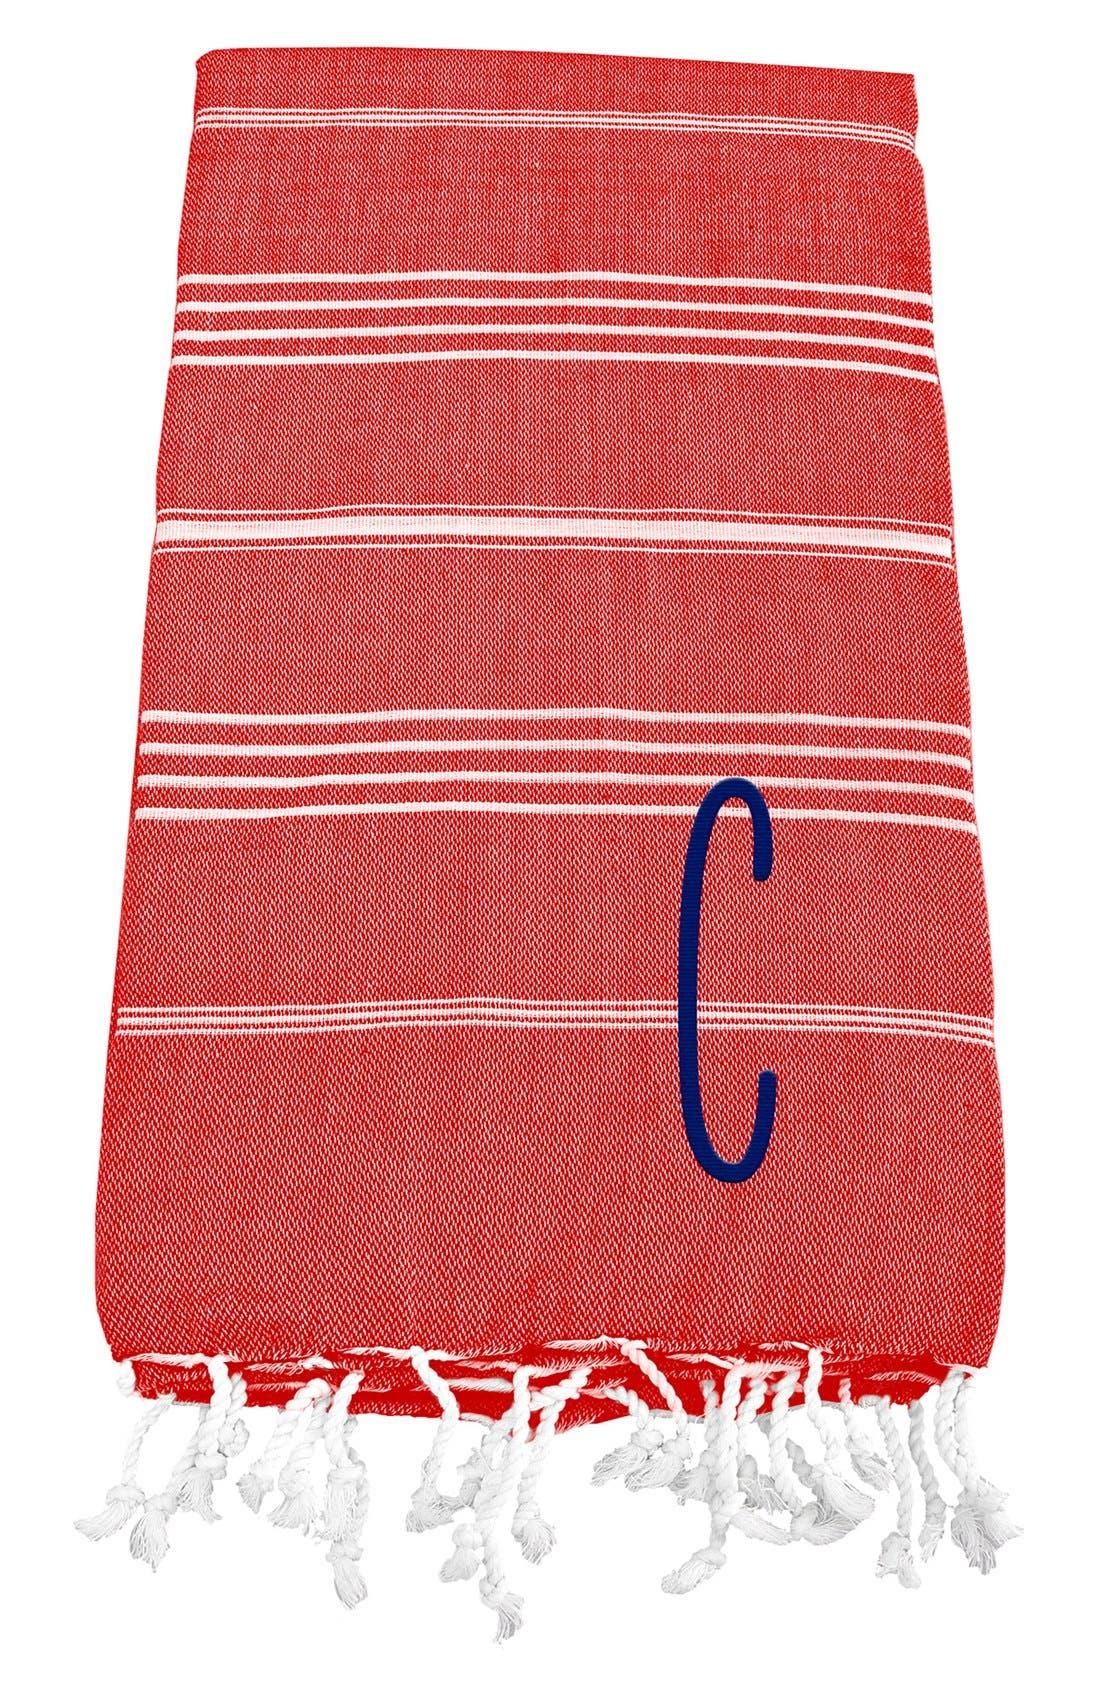 Monogram Turkish Cotton Towel,                             Main thumbnail 112, color,